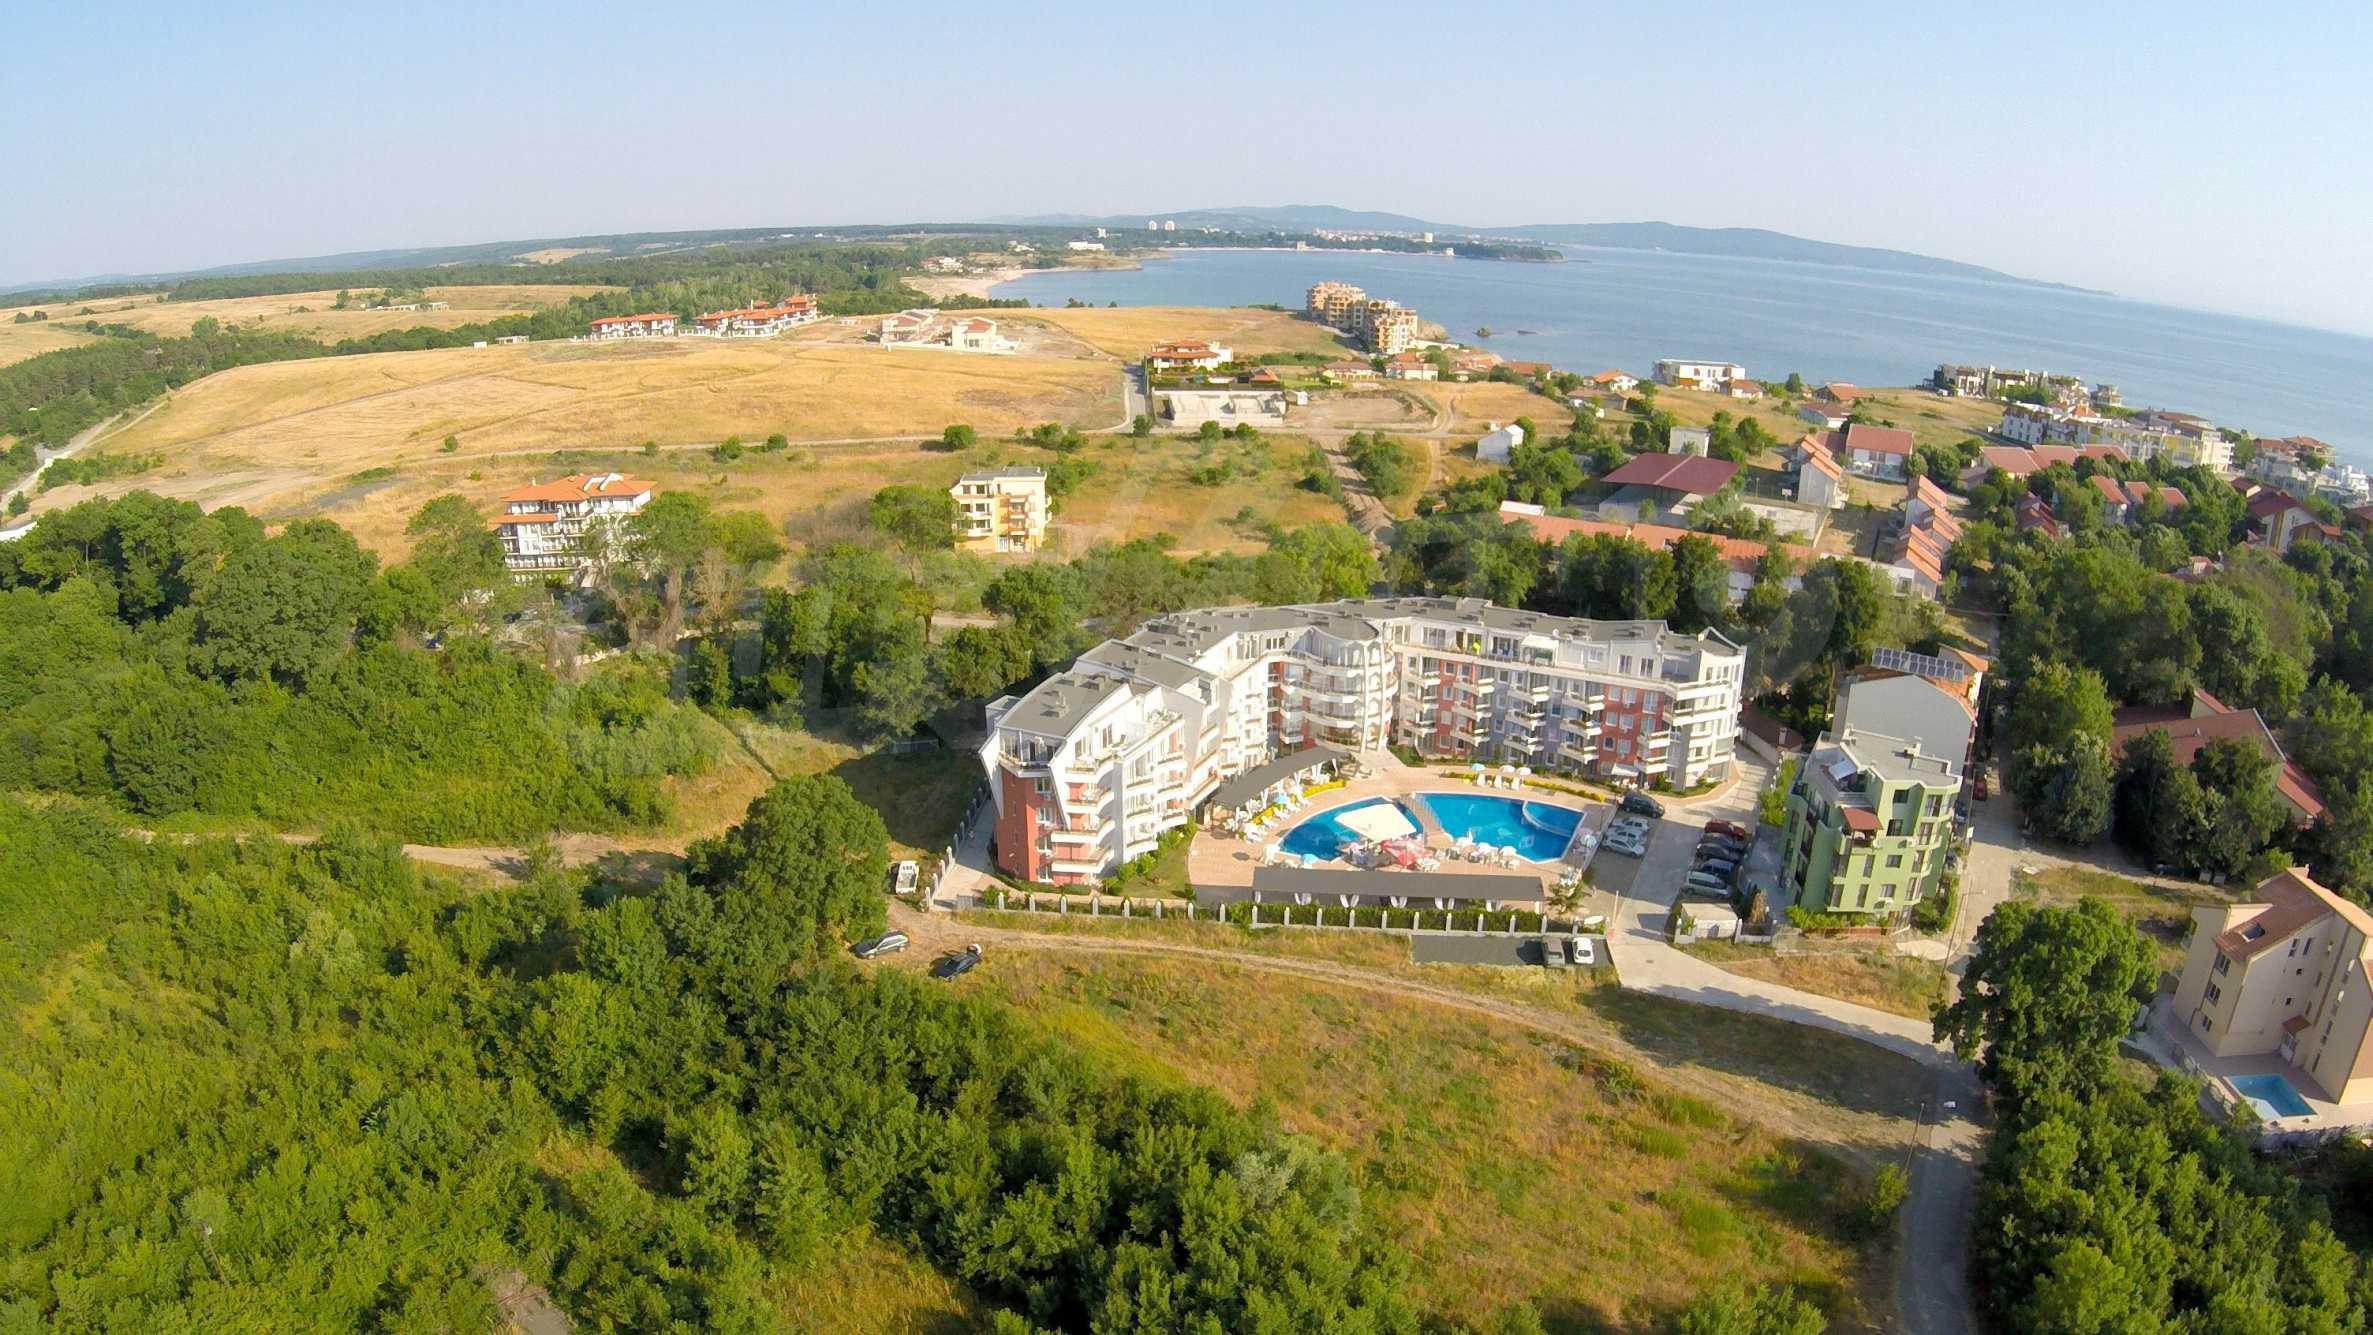 Трехкомнатный апартамент на продажу в комплексе Emberli в курорте Лозенец 27